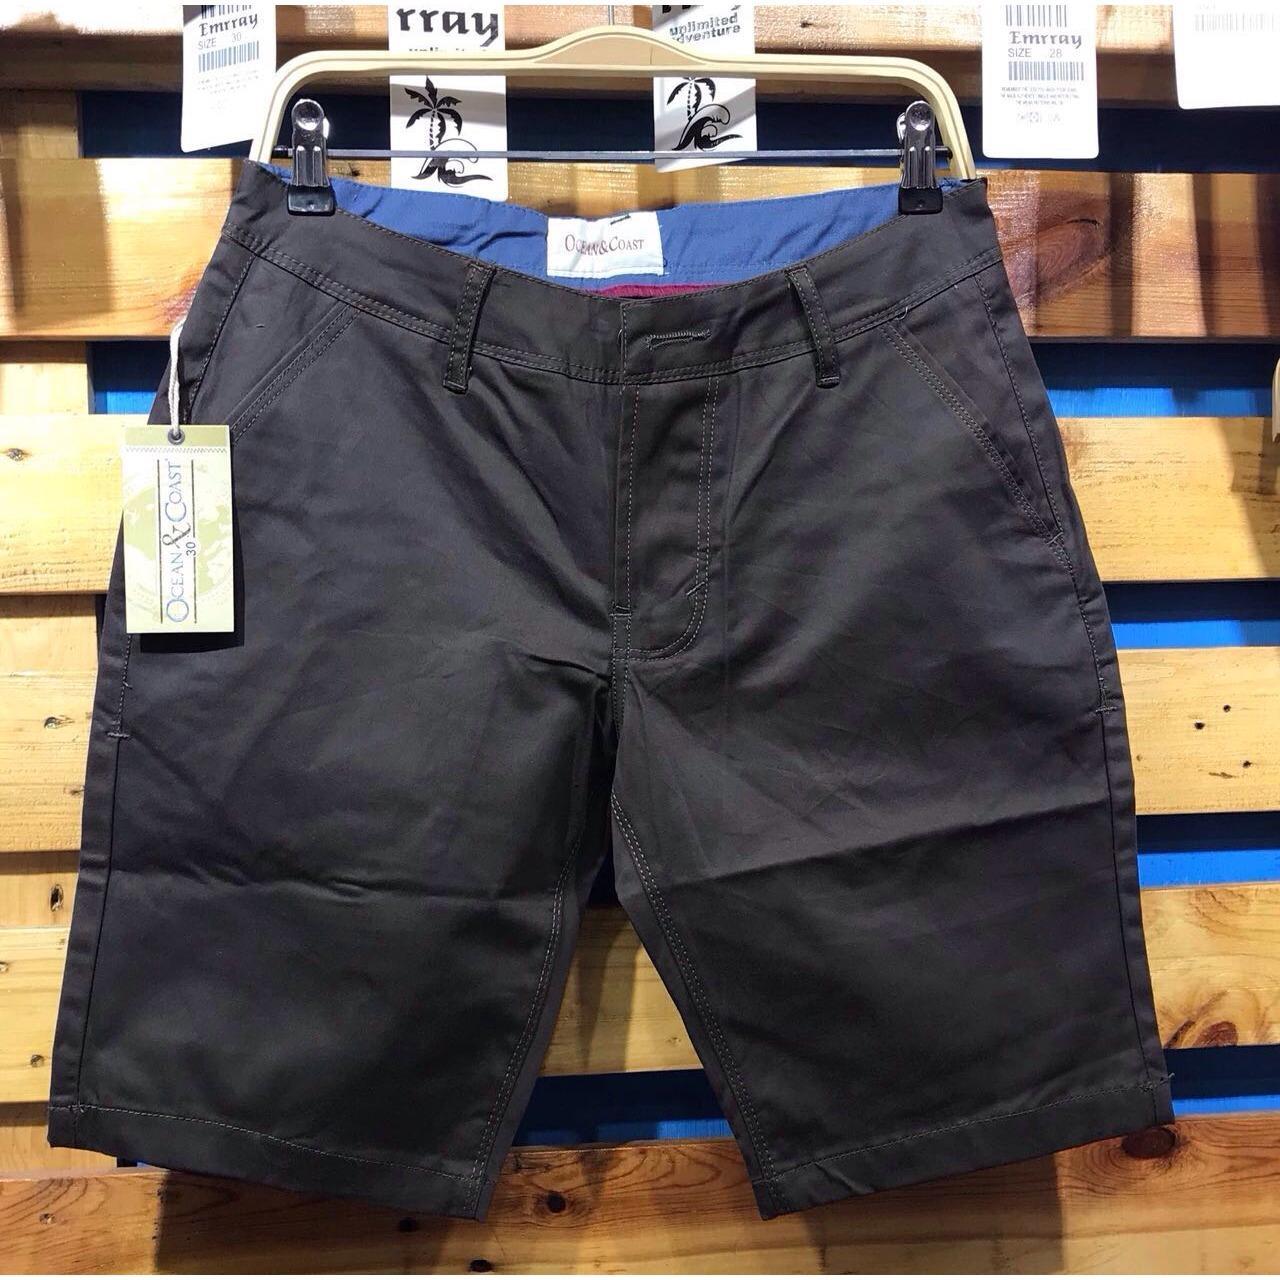 Tb Santai Pria Korea Ukuran Besar Celana Pantai Biru International Source Jayasinar Celana Pendek Chino